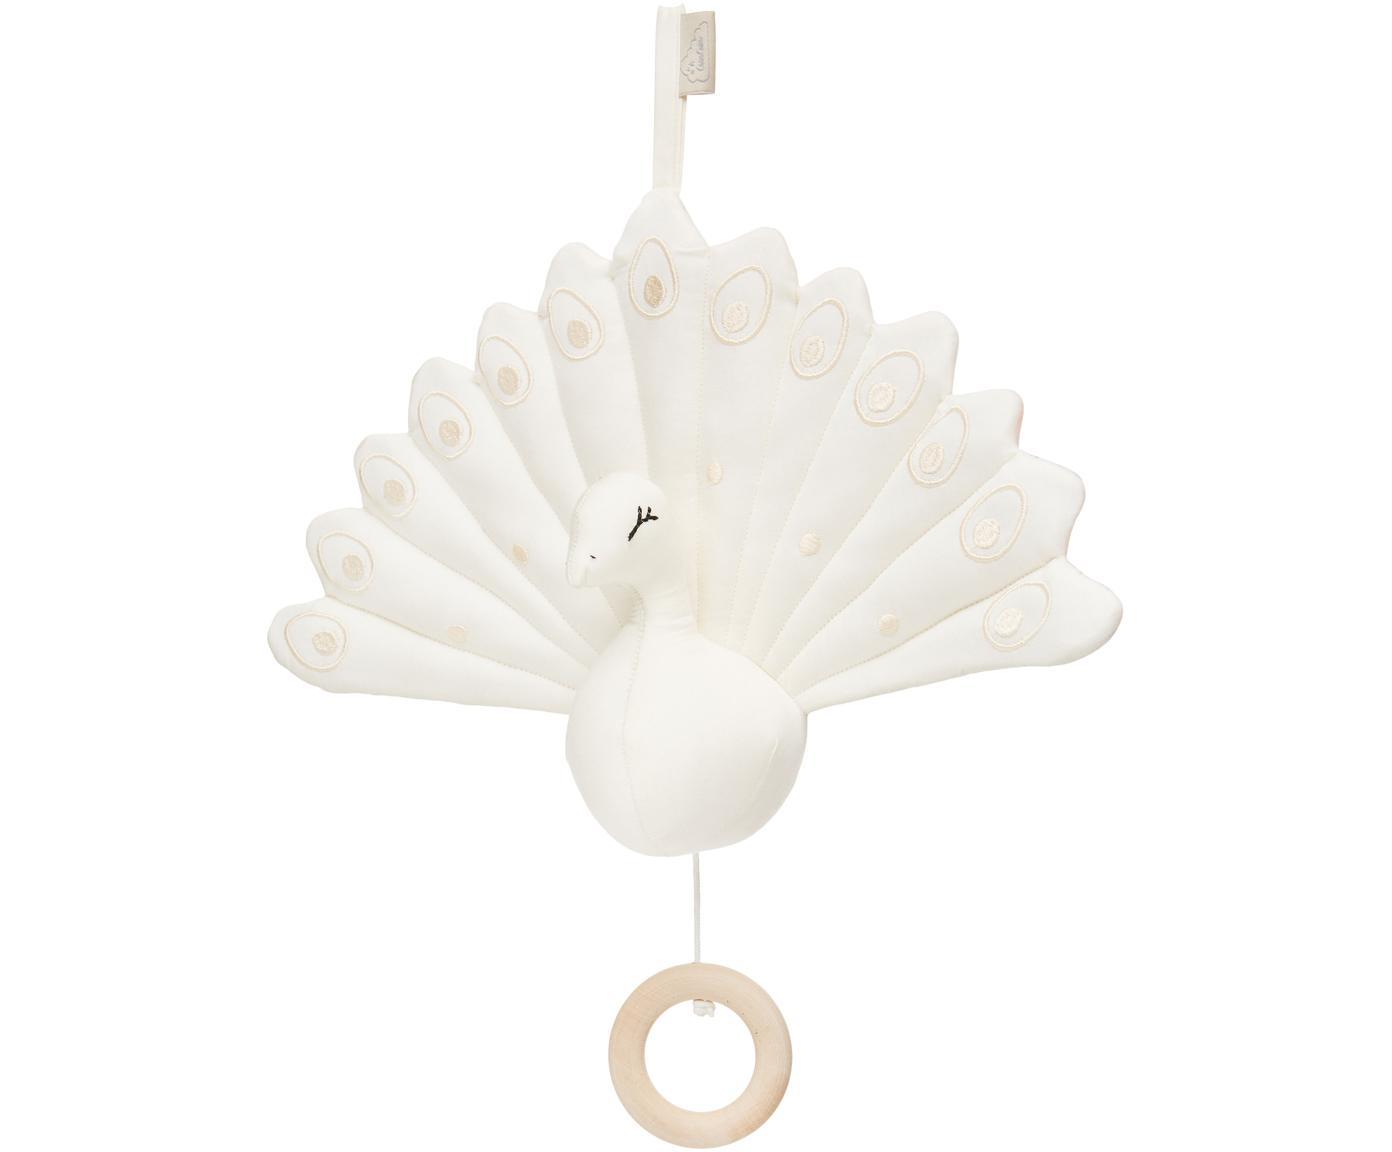 Muziekmobiel Peacock, Bekleding: organisch katoen, Crèmekleurig, 18 x 24 cm